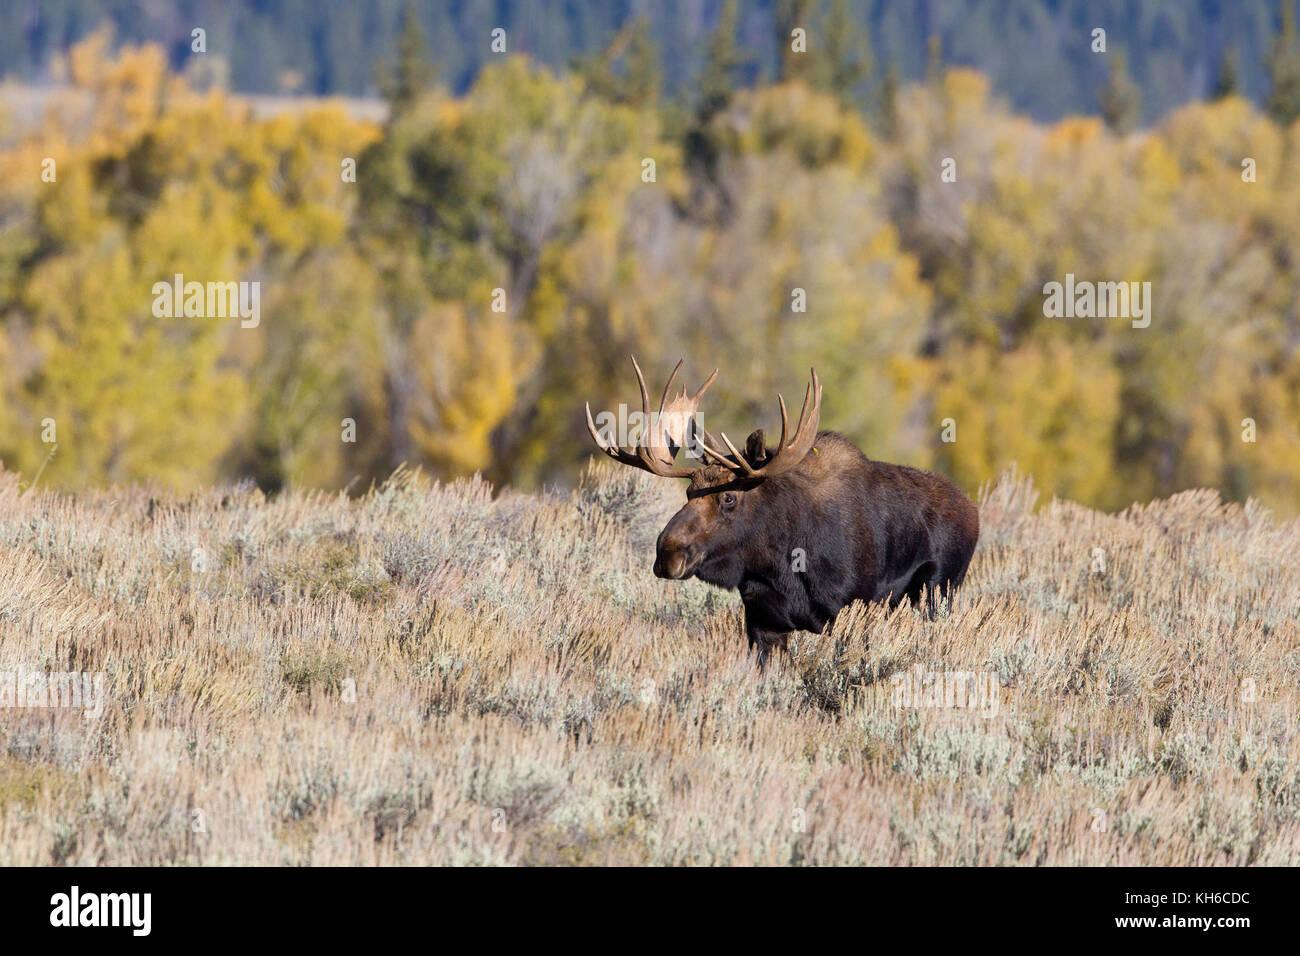 Bull Moose Stock Photo